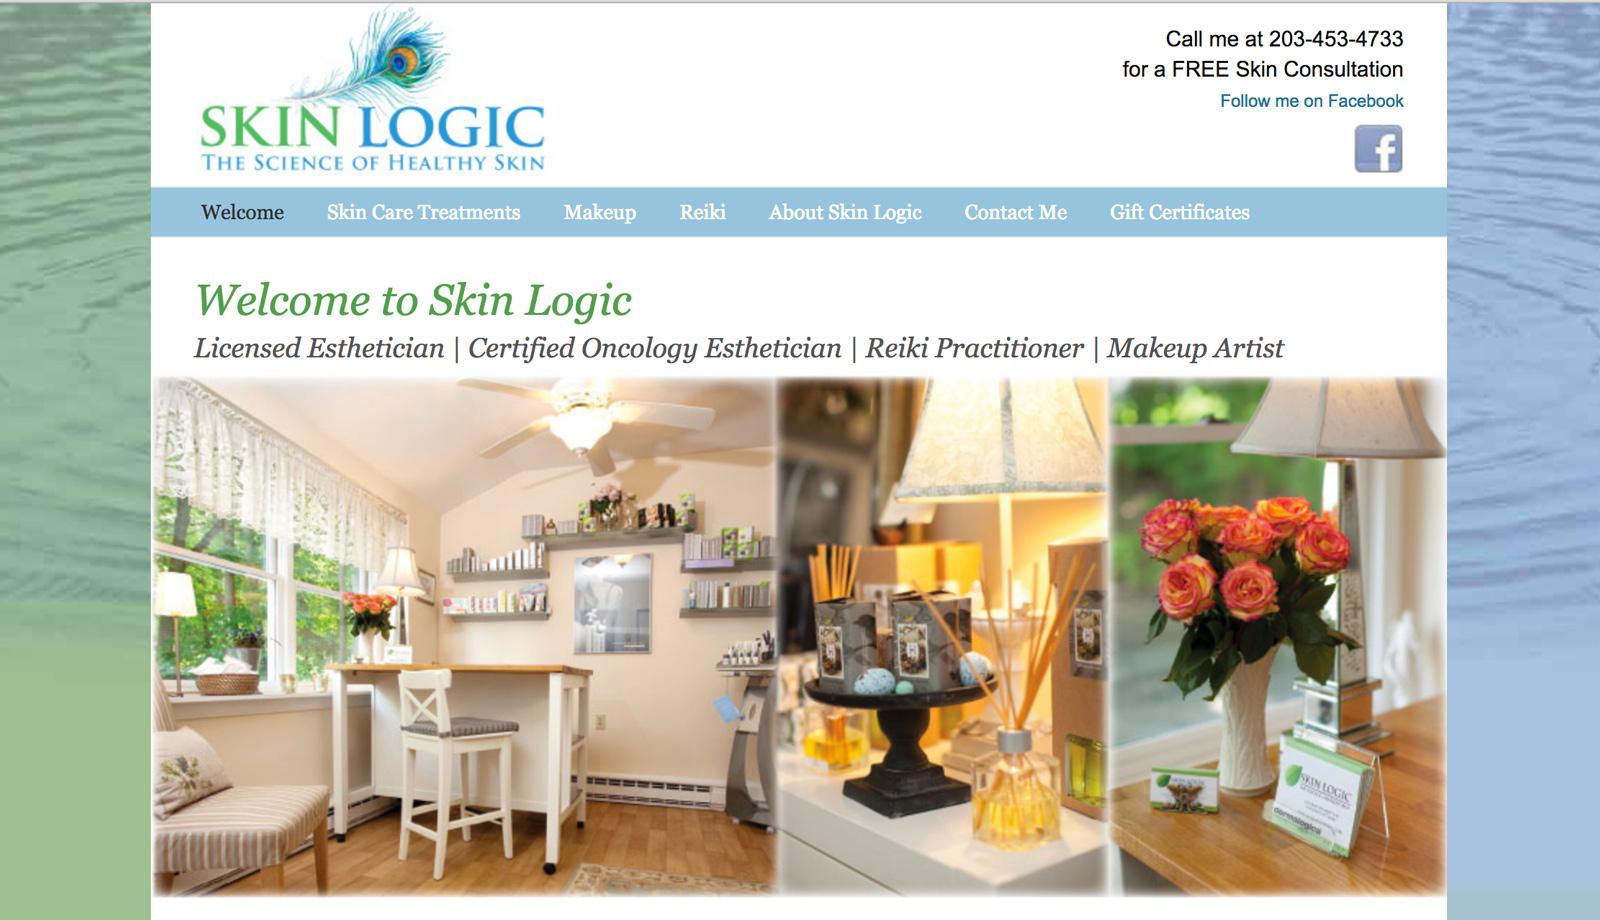 web design for healthcare services